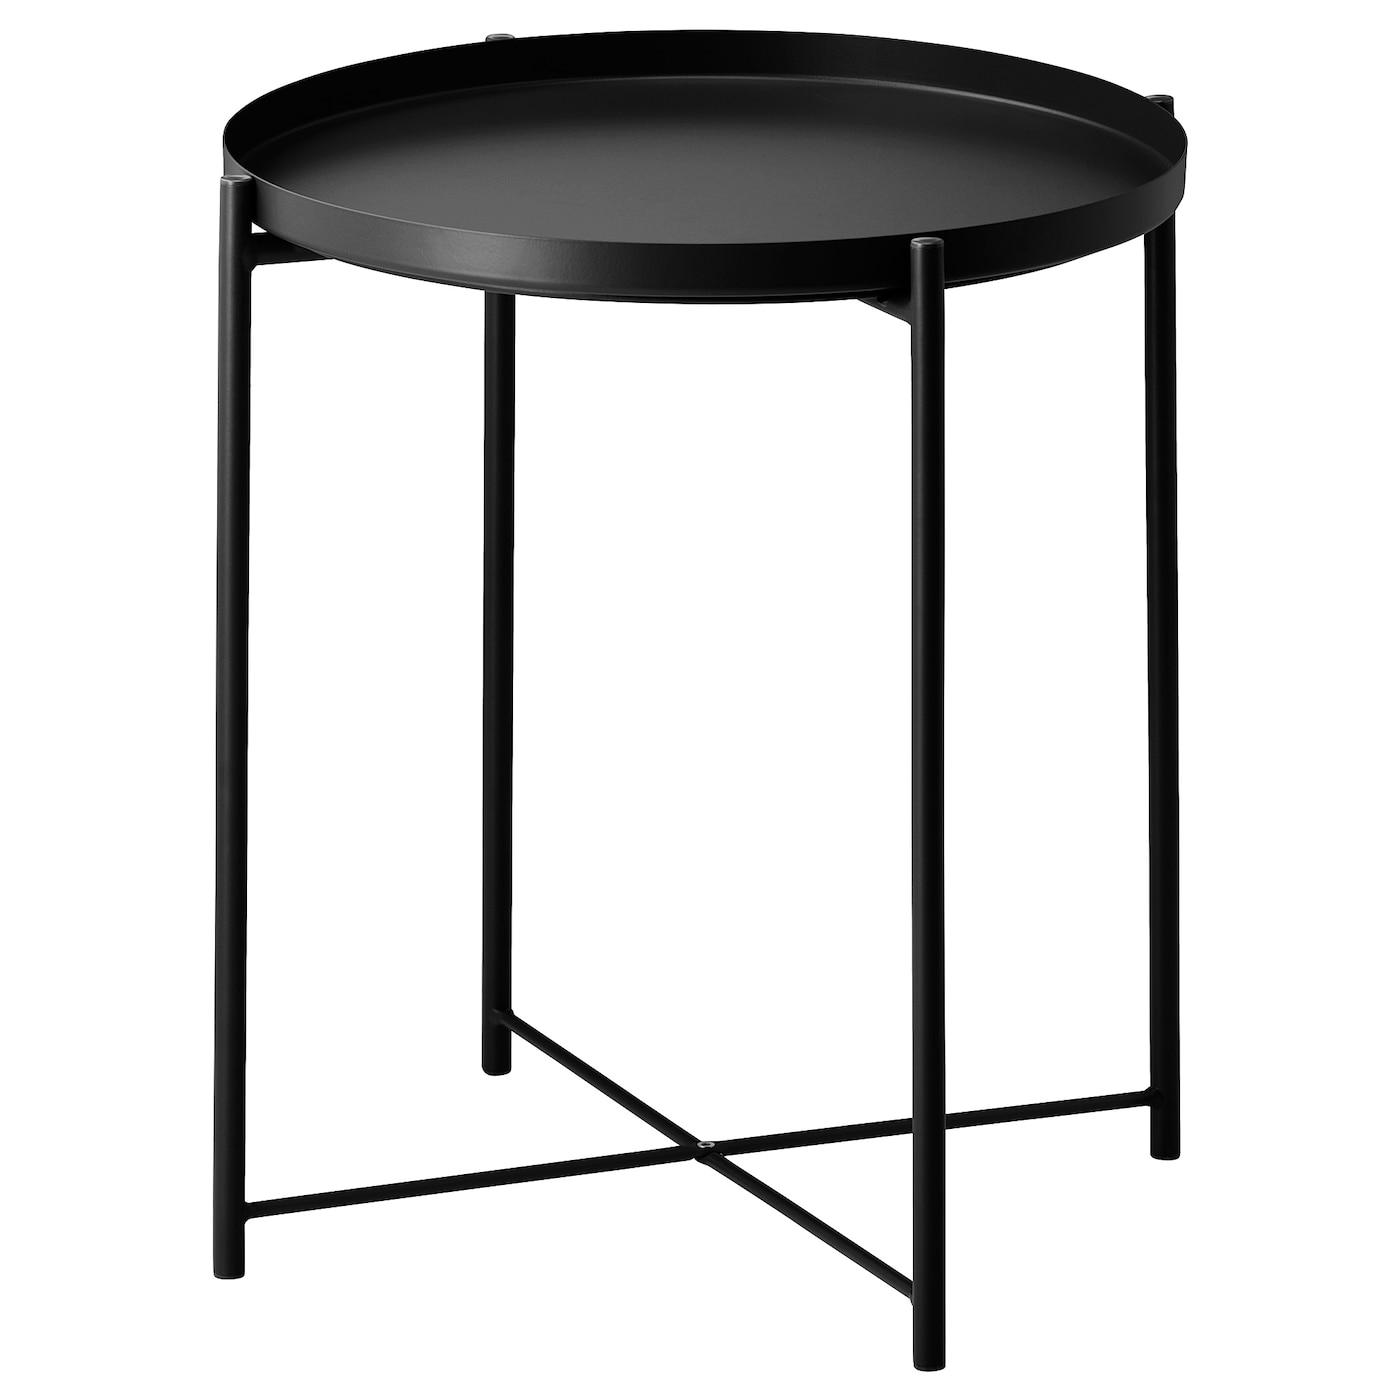 Gladom Black Tray Table 45x53 Cm Ikea